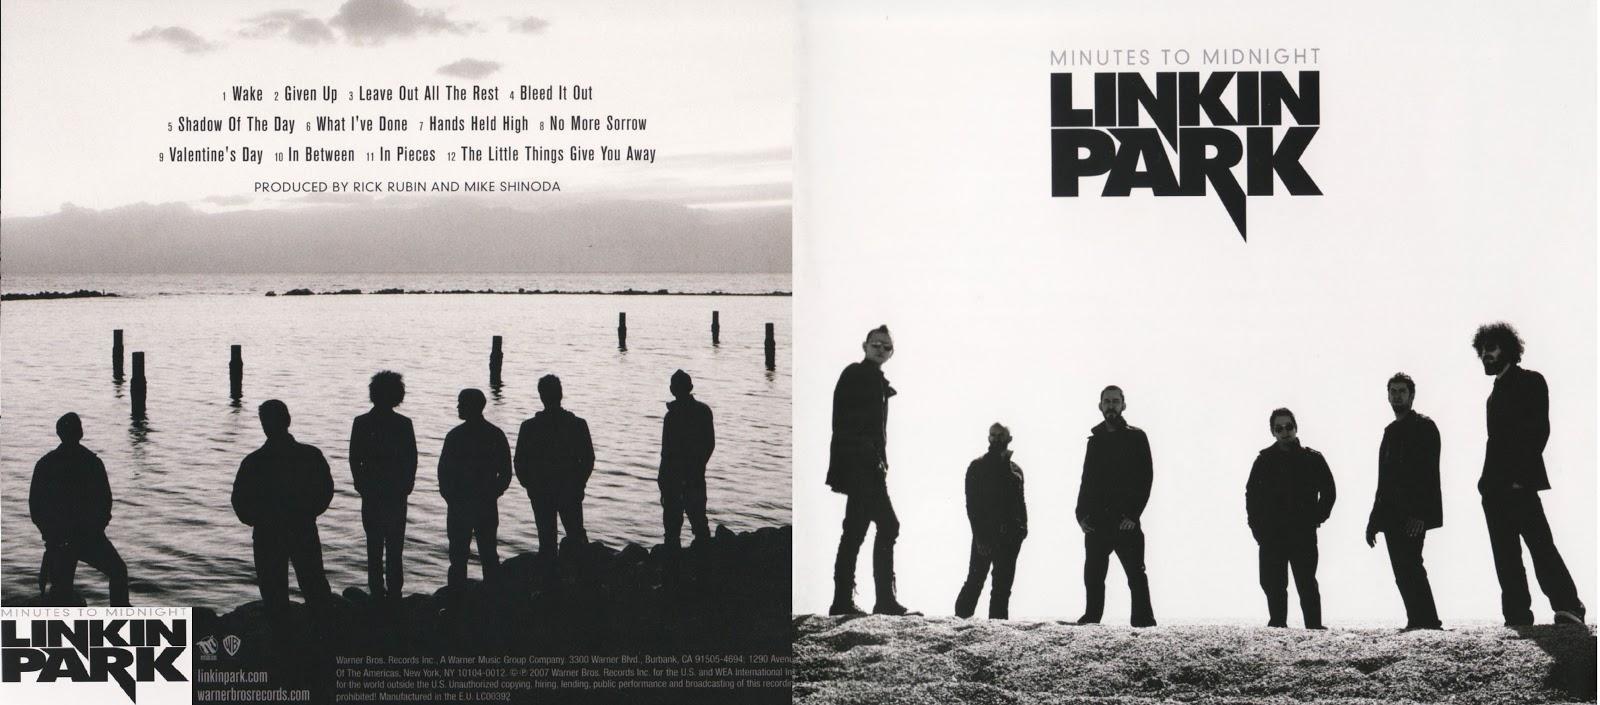 Linkin park minutes to midnight скачать альбом бесплатно torrent.